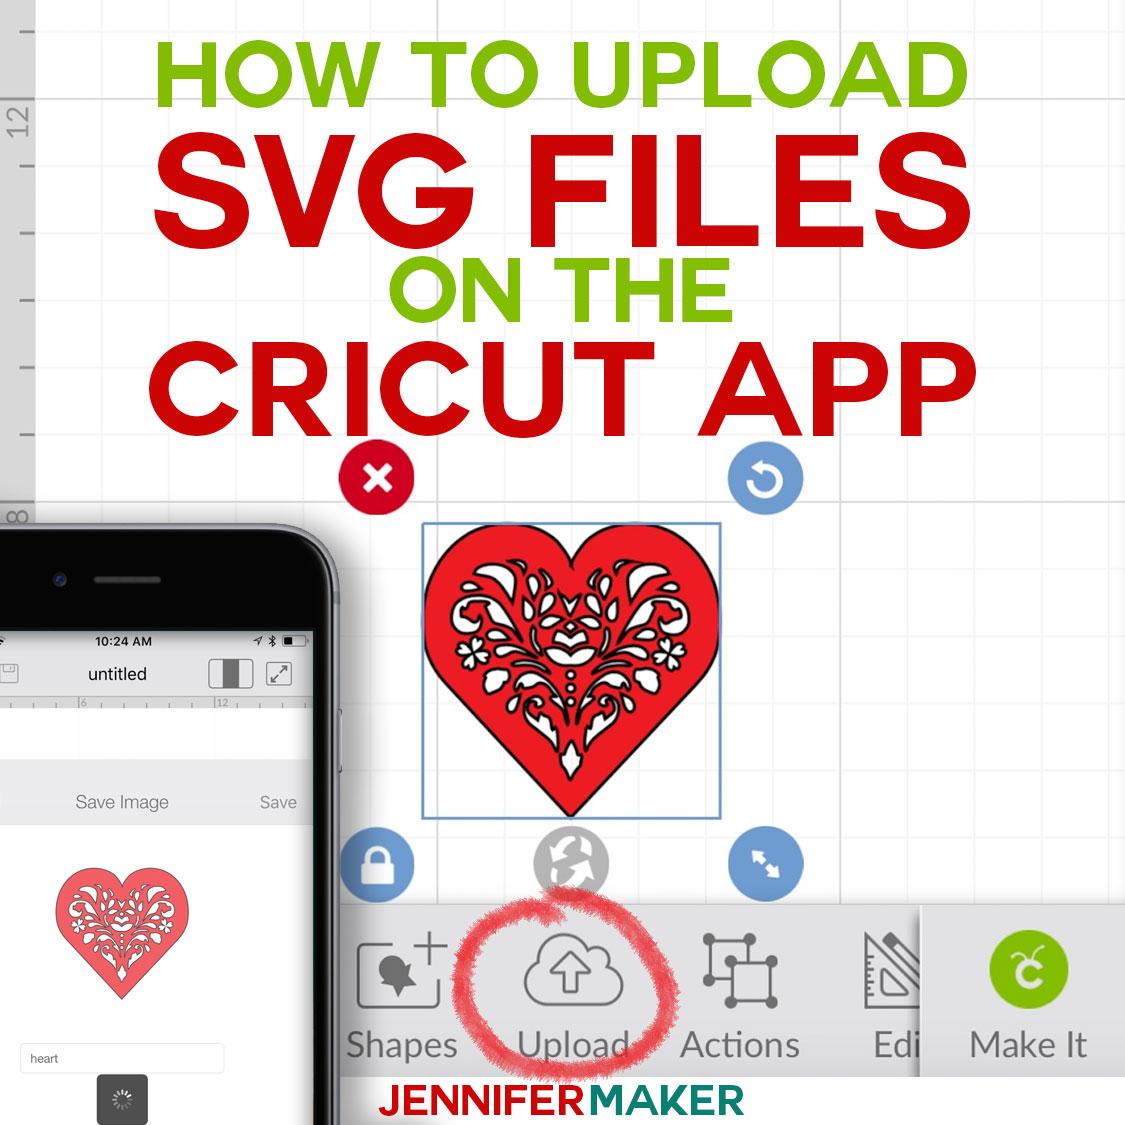 Download 25+ Free Svg Downloads For Cricut Explore Air 2 Pics